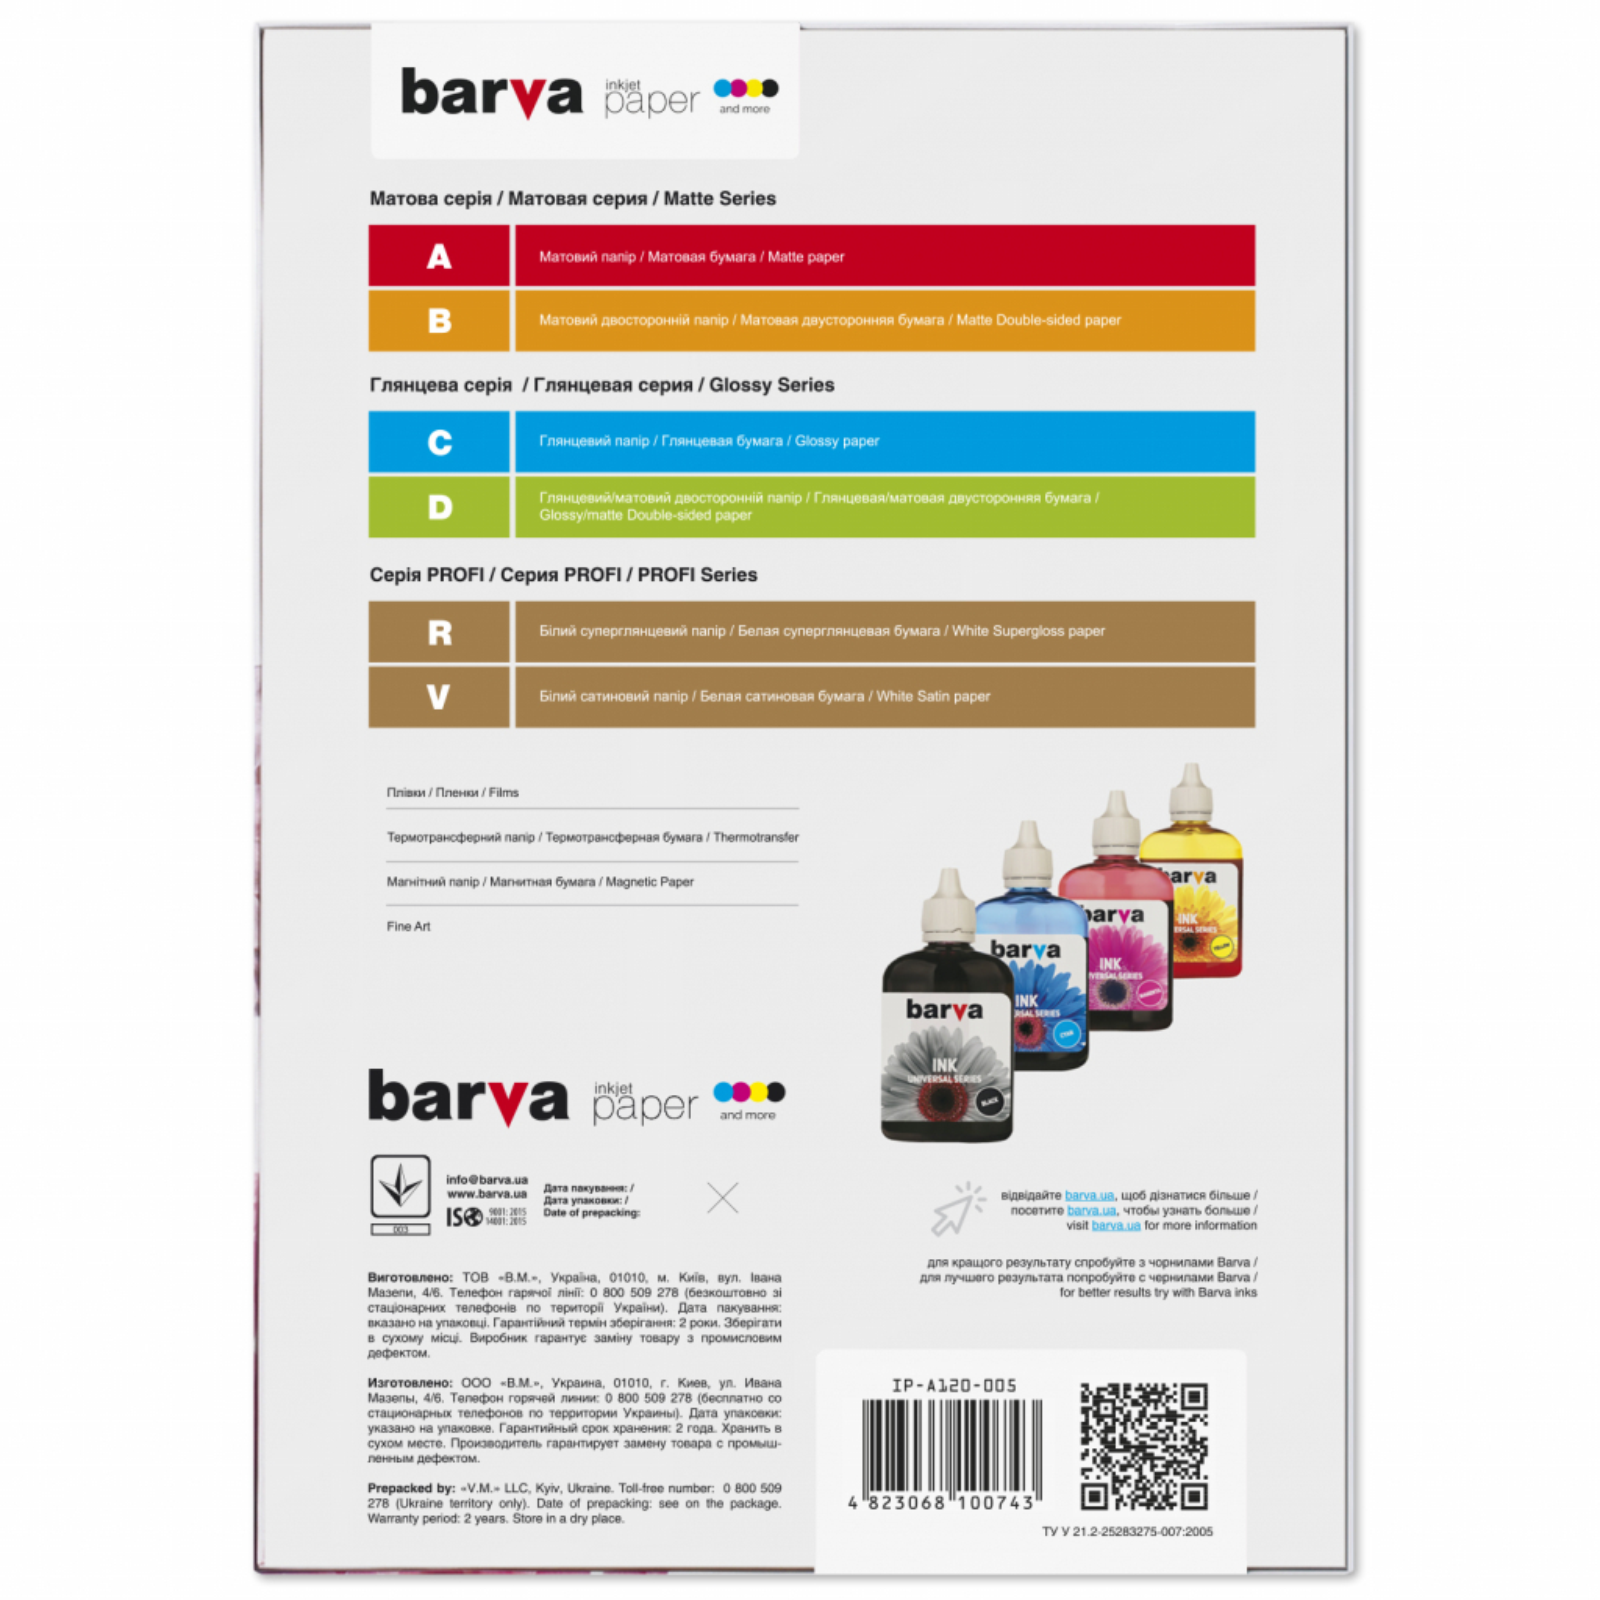 Бумага Barva A4 (IP-A120-005) изображение 2